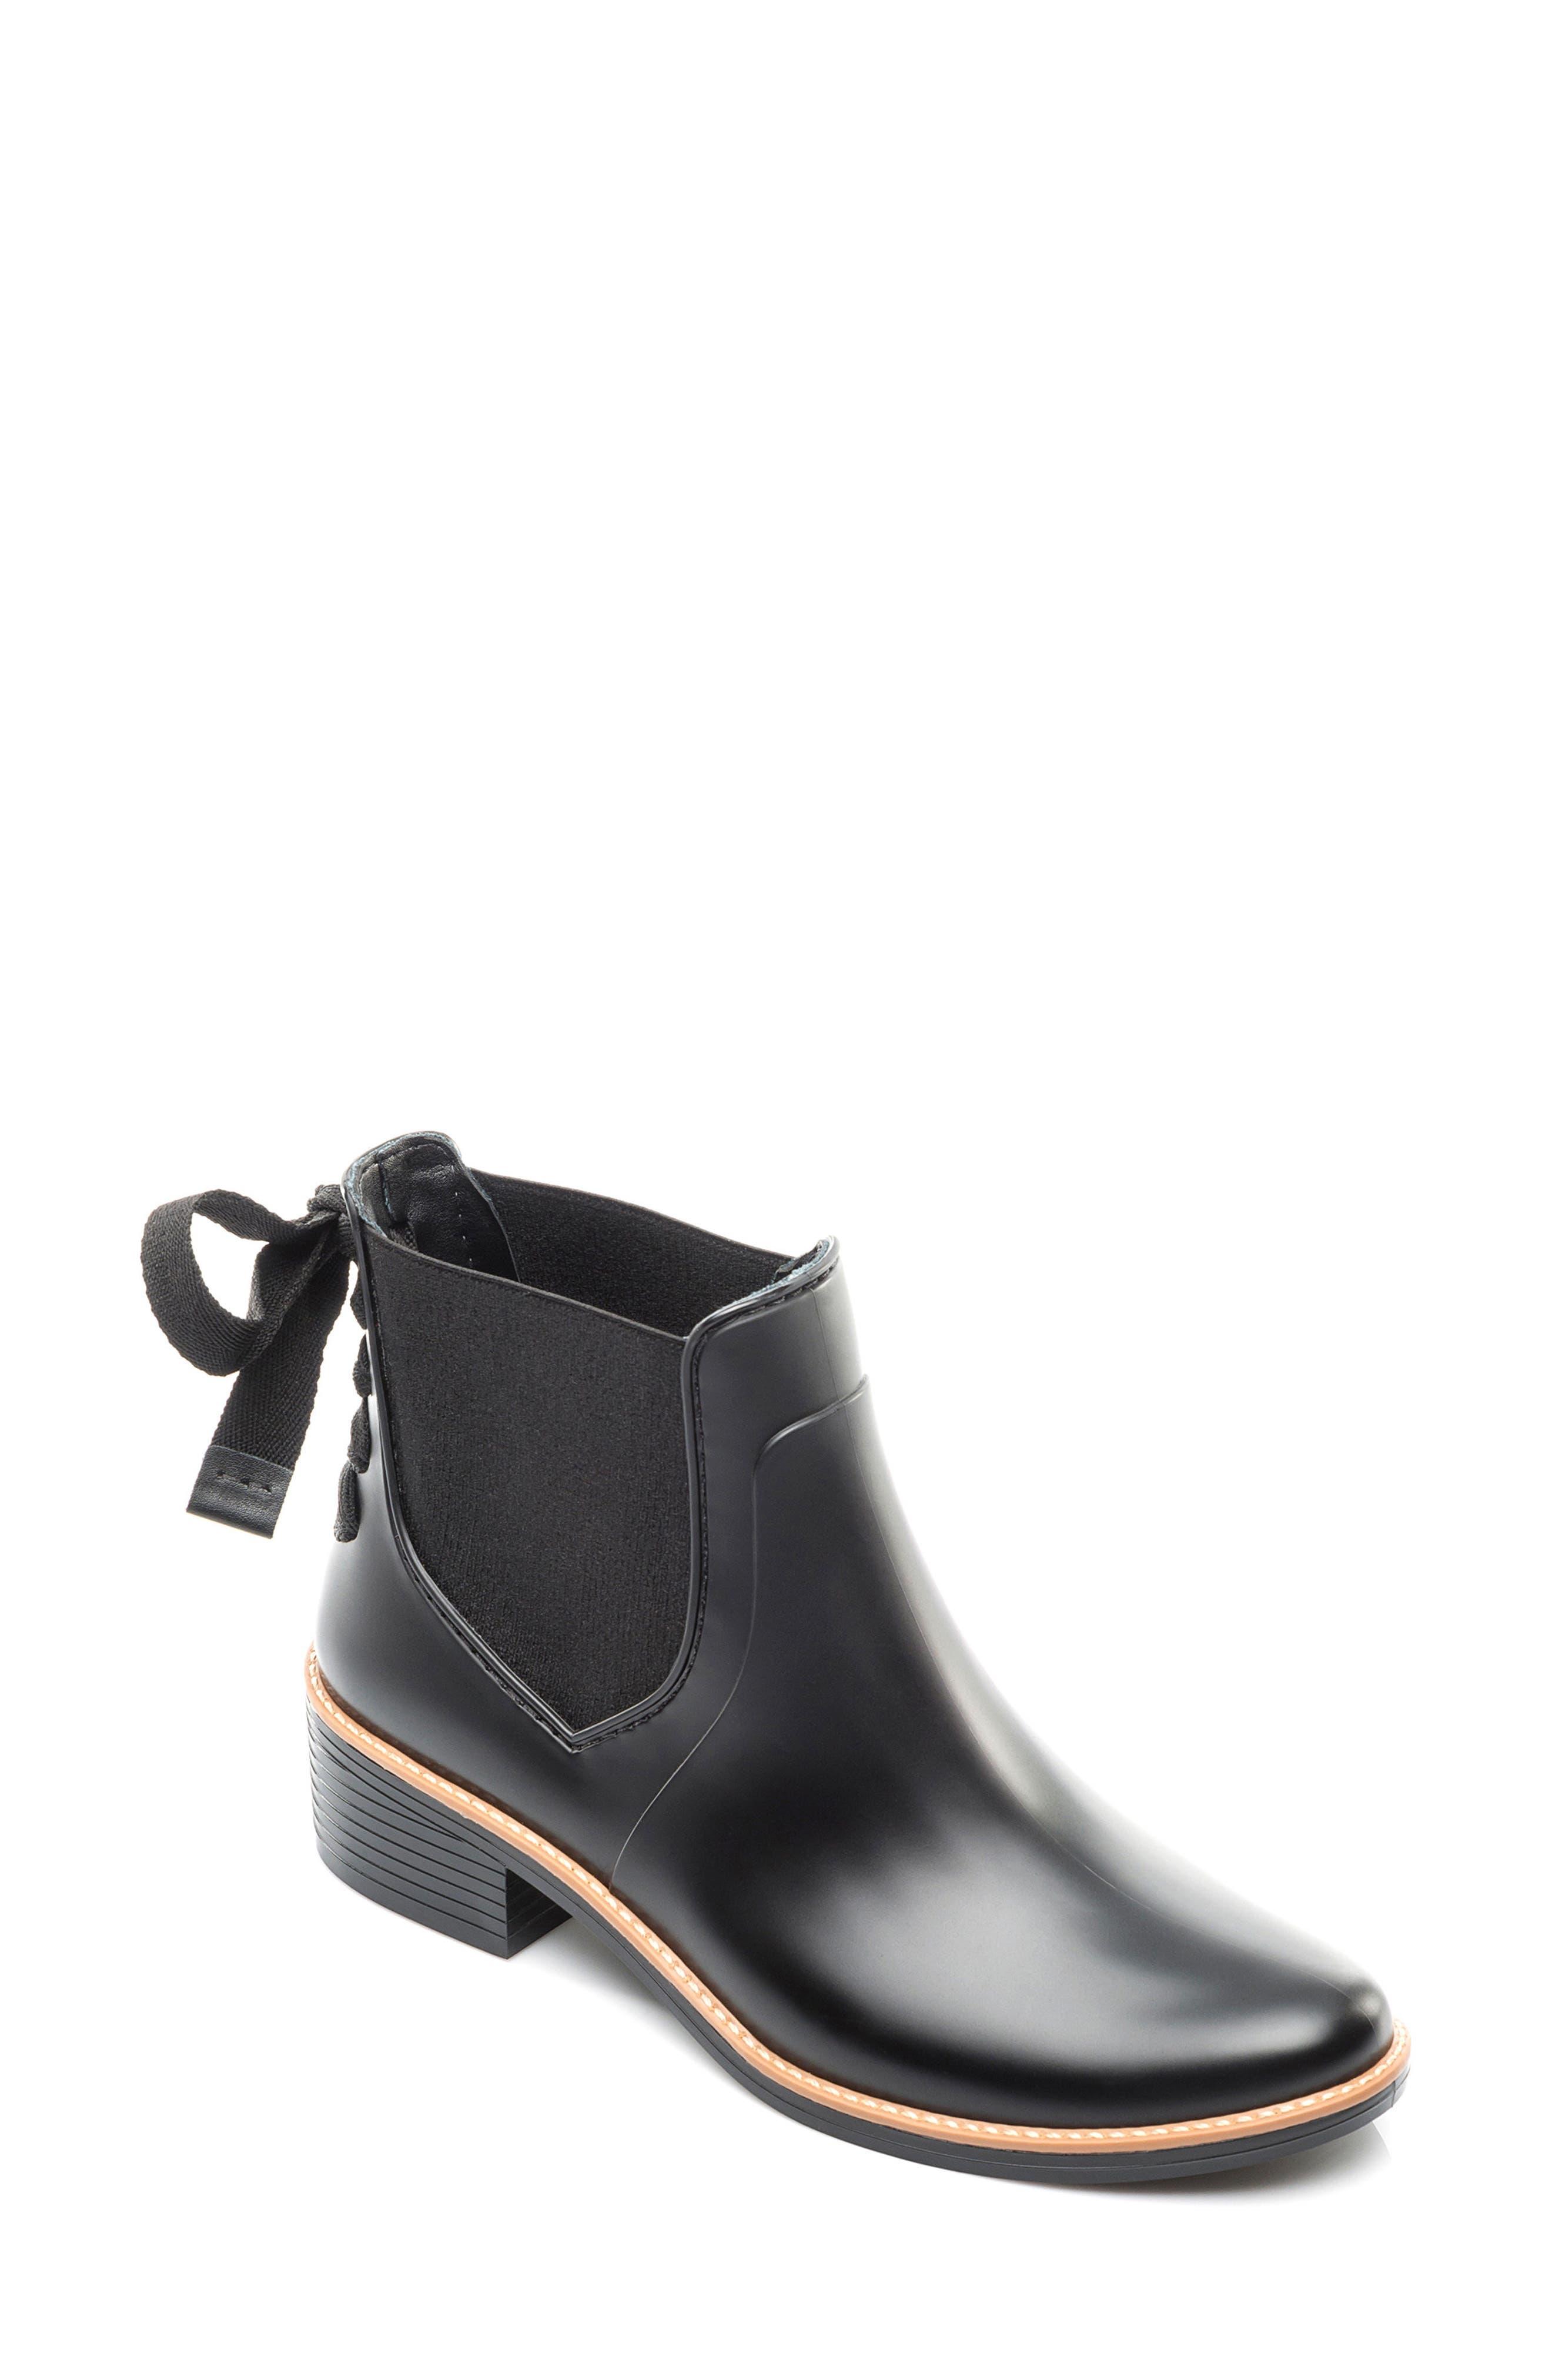 BERNARDO Paxton Waterproof Rain Boot, Main, color, BLACK